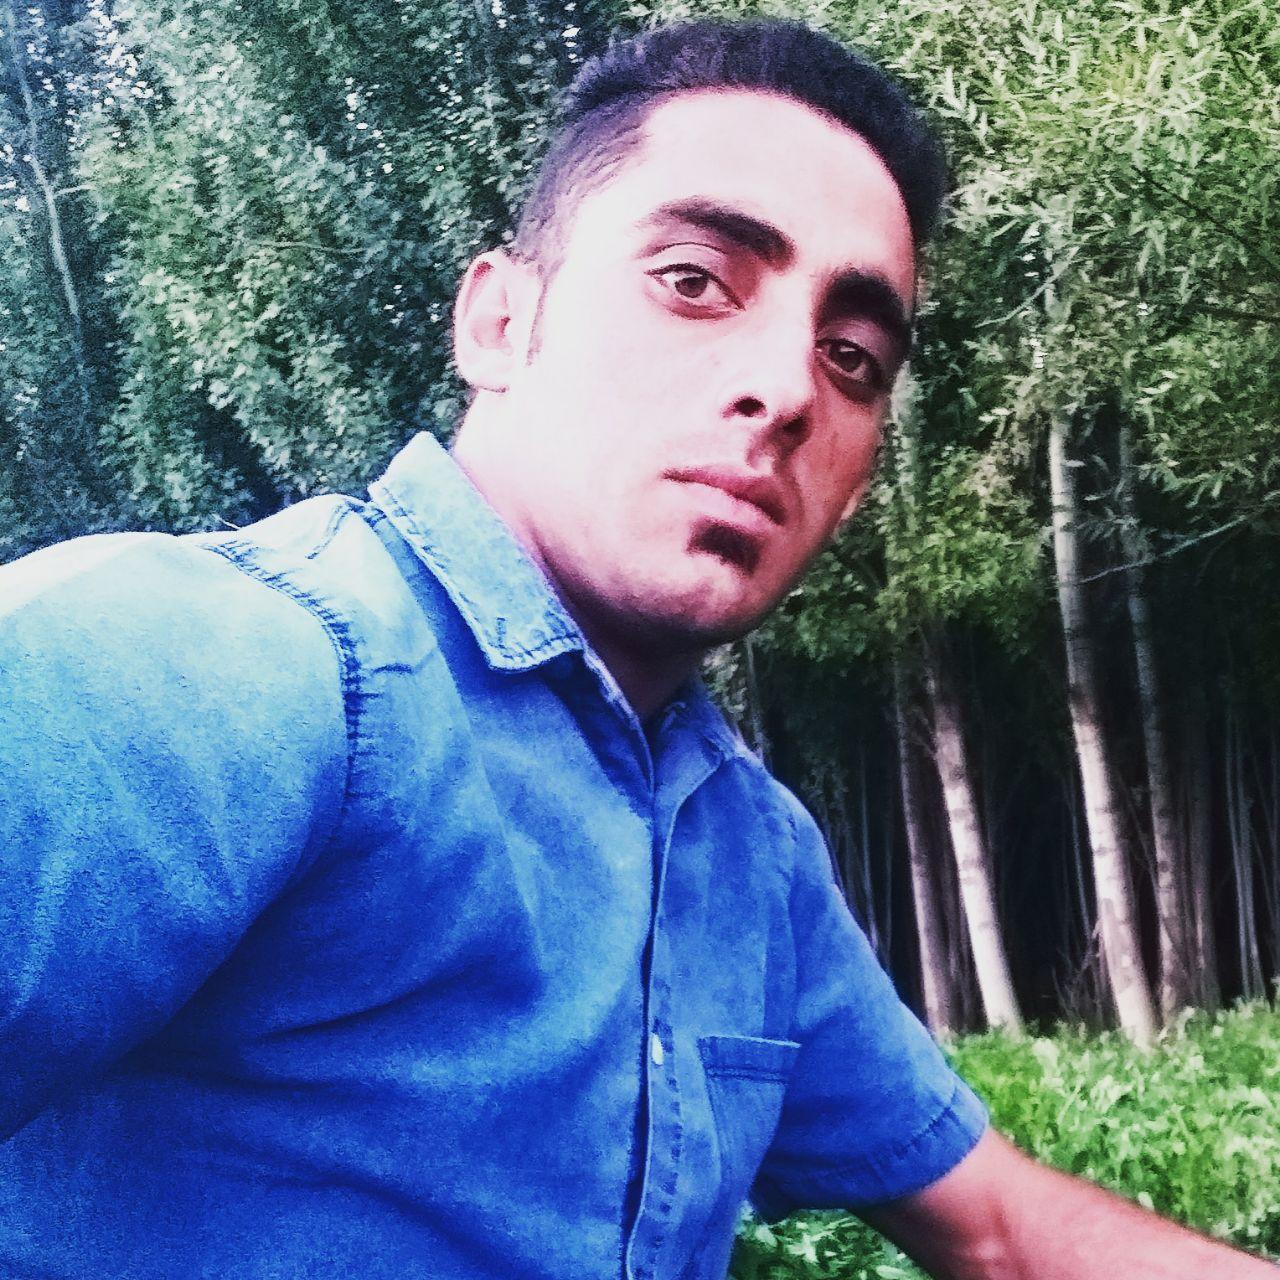 82 AliAzizpur Shirin آهنگ شیرین از علی عزیزپور